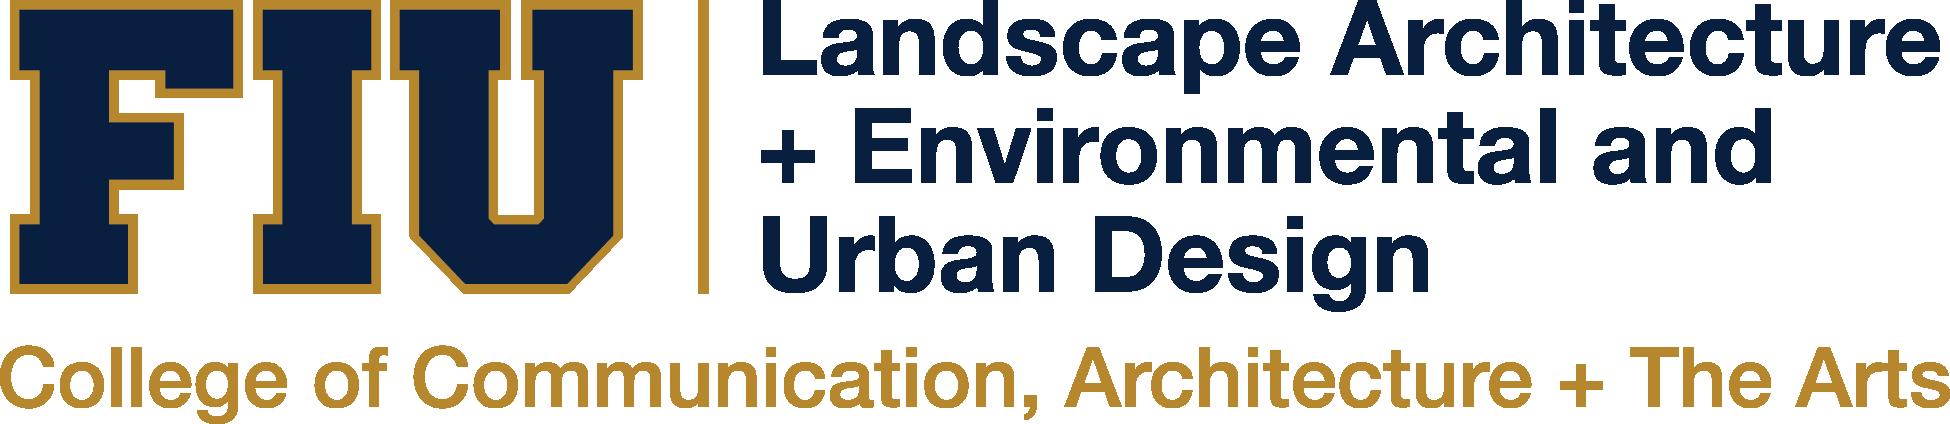 Department of Landscape Architecture Logo